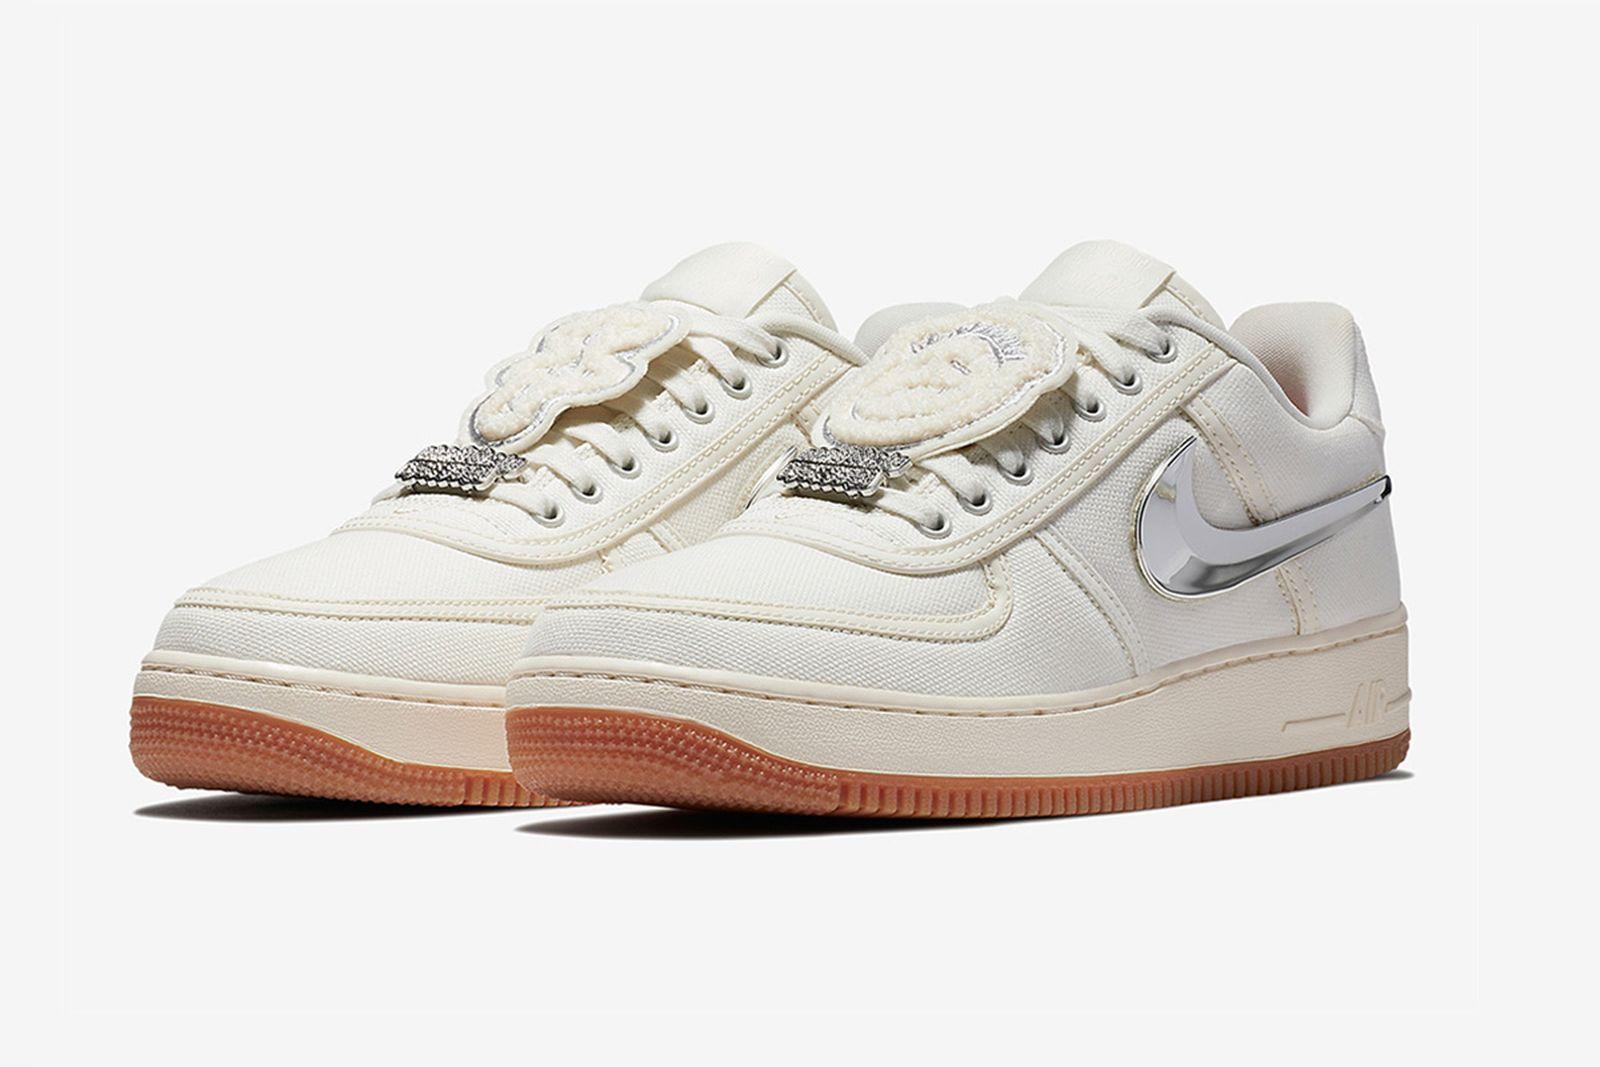 travis scott sneaker collaboration history Air Jordan Nike